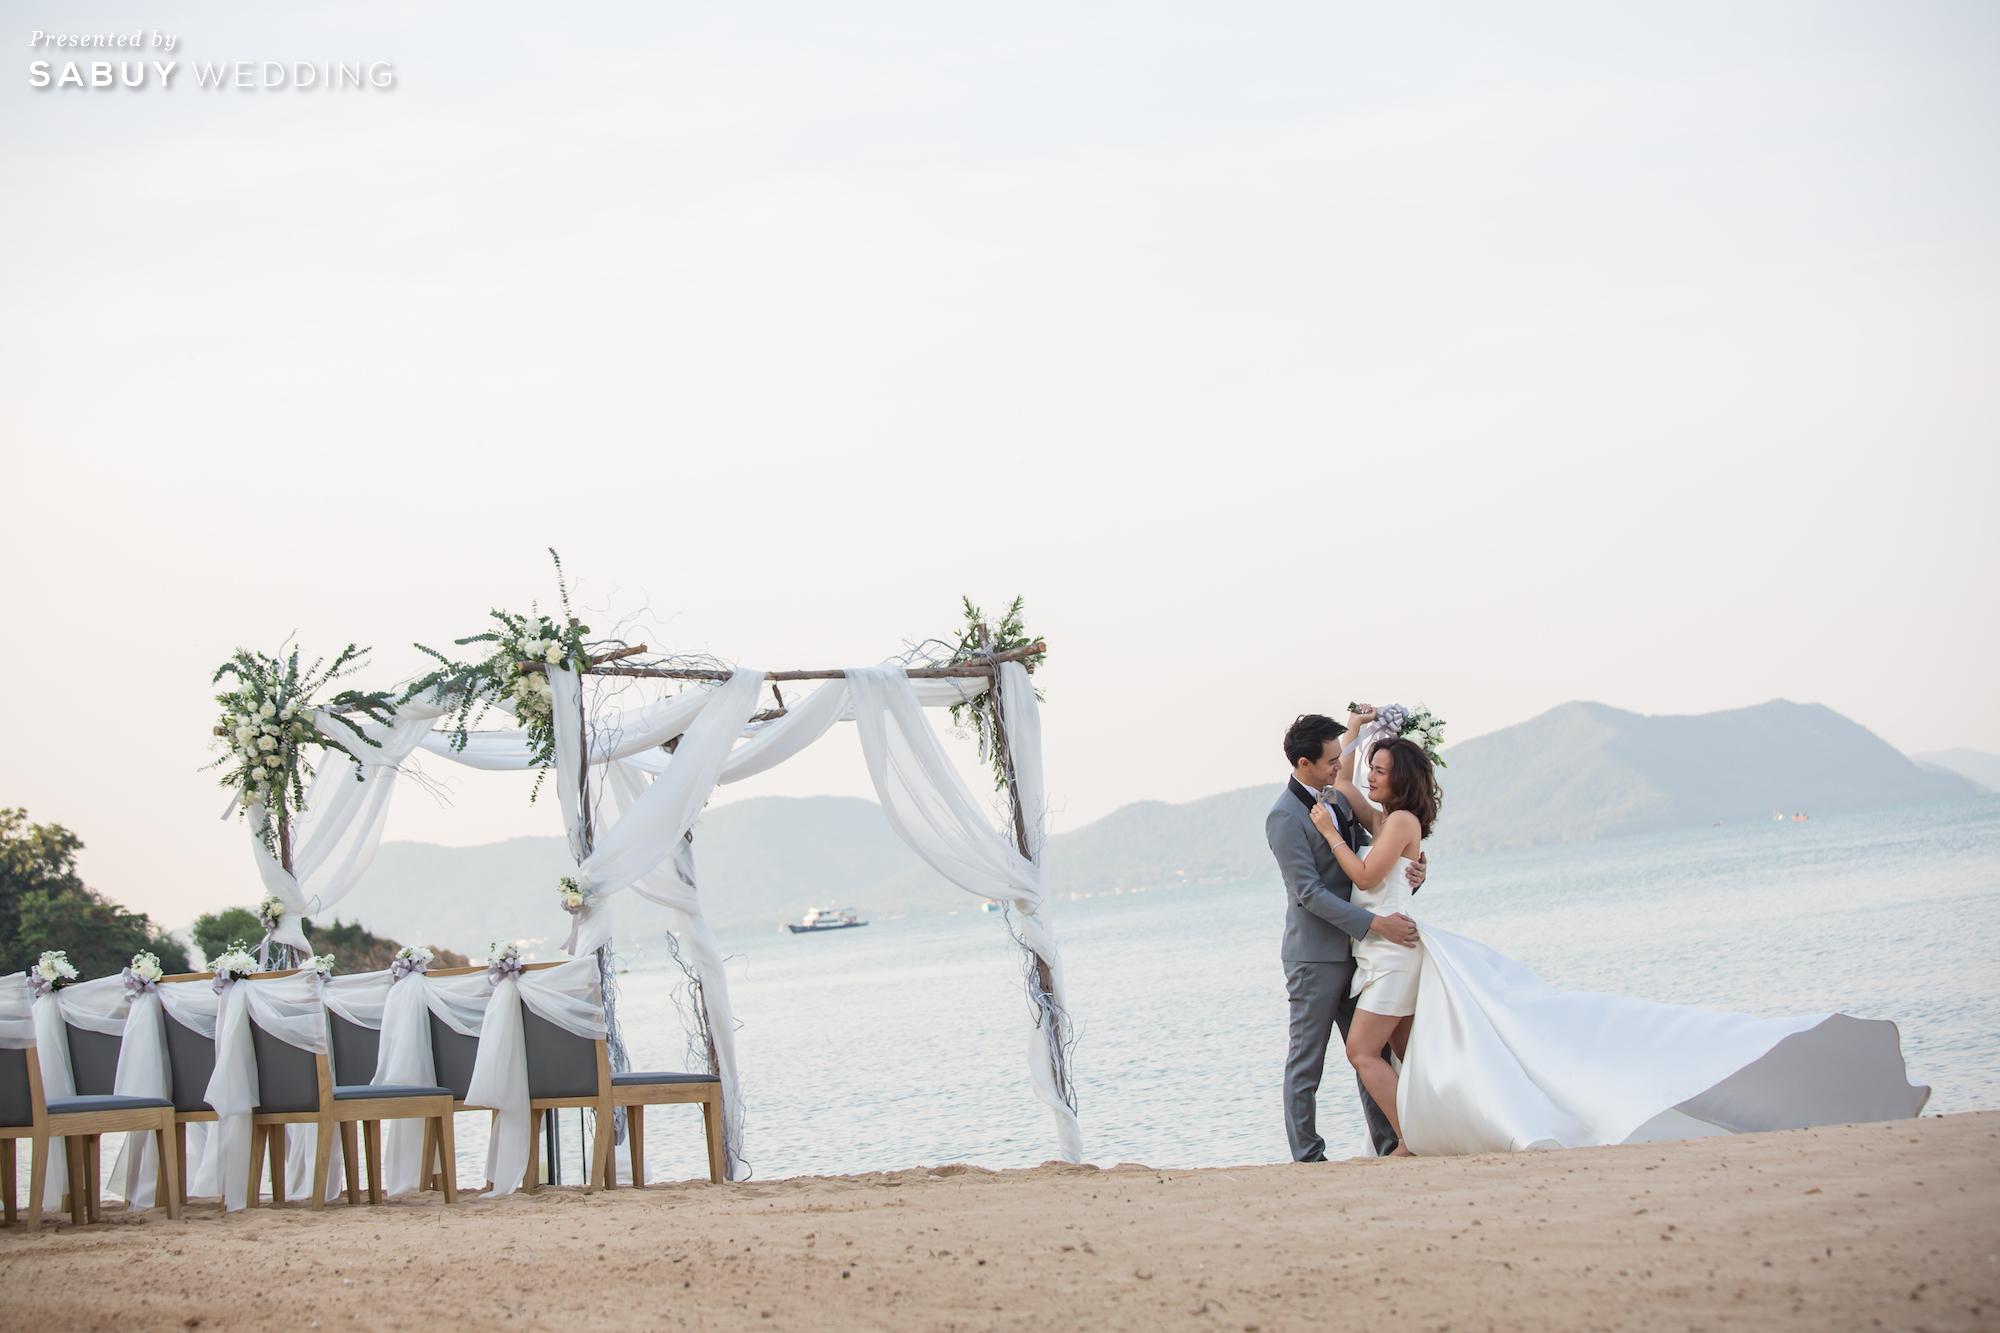 RENAISSANCE PATTAYA RESORT & SPA,Marriott Wedding Thailand,แมริออท ประเทศไทย,สถานที่แต่งงาน,สถานที่จัดงานแต่งงาน,โรงแรม,งานแต่งงาน,งานเลี้ยง ครบทุกความต้องการของบ่าวสาว กับ 40 สถานที่แต่งงานในเครือ Marriott